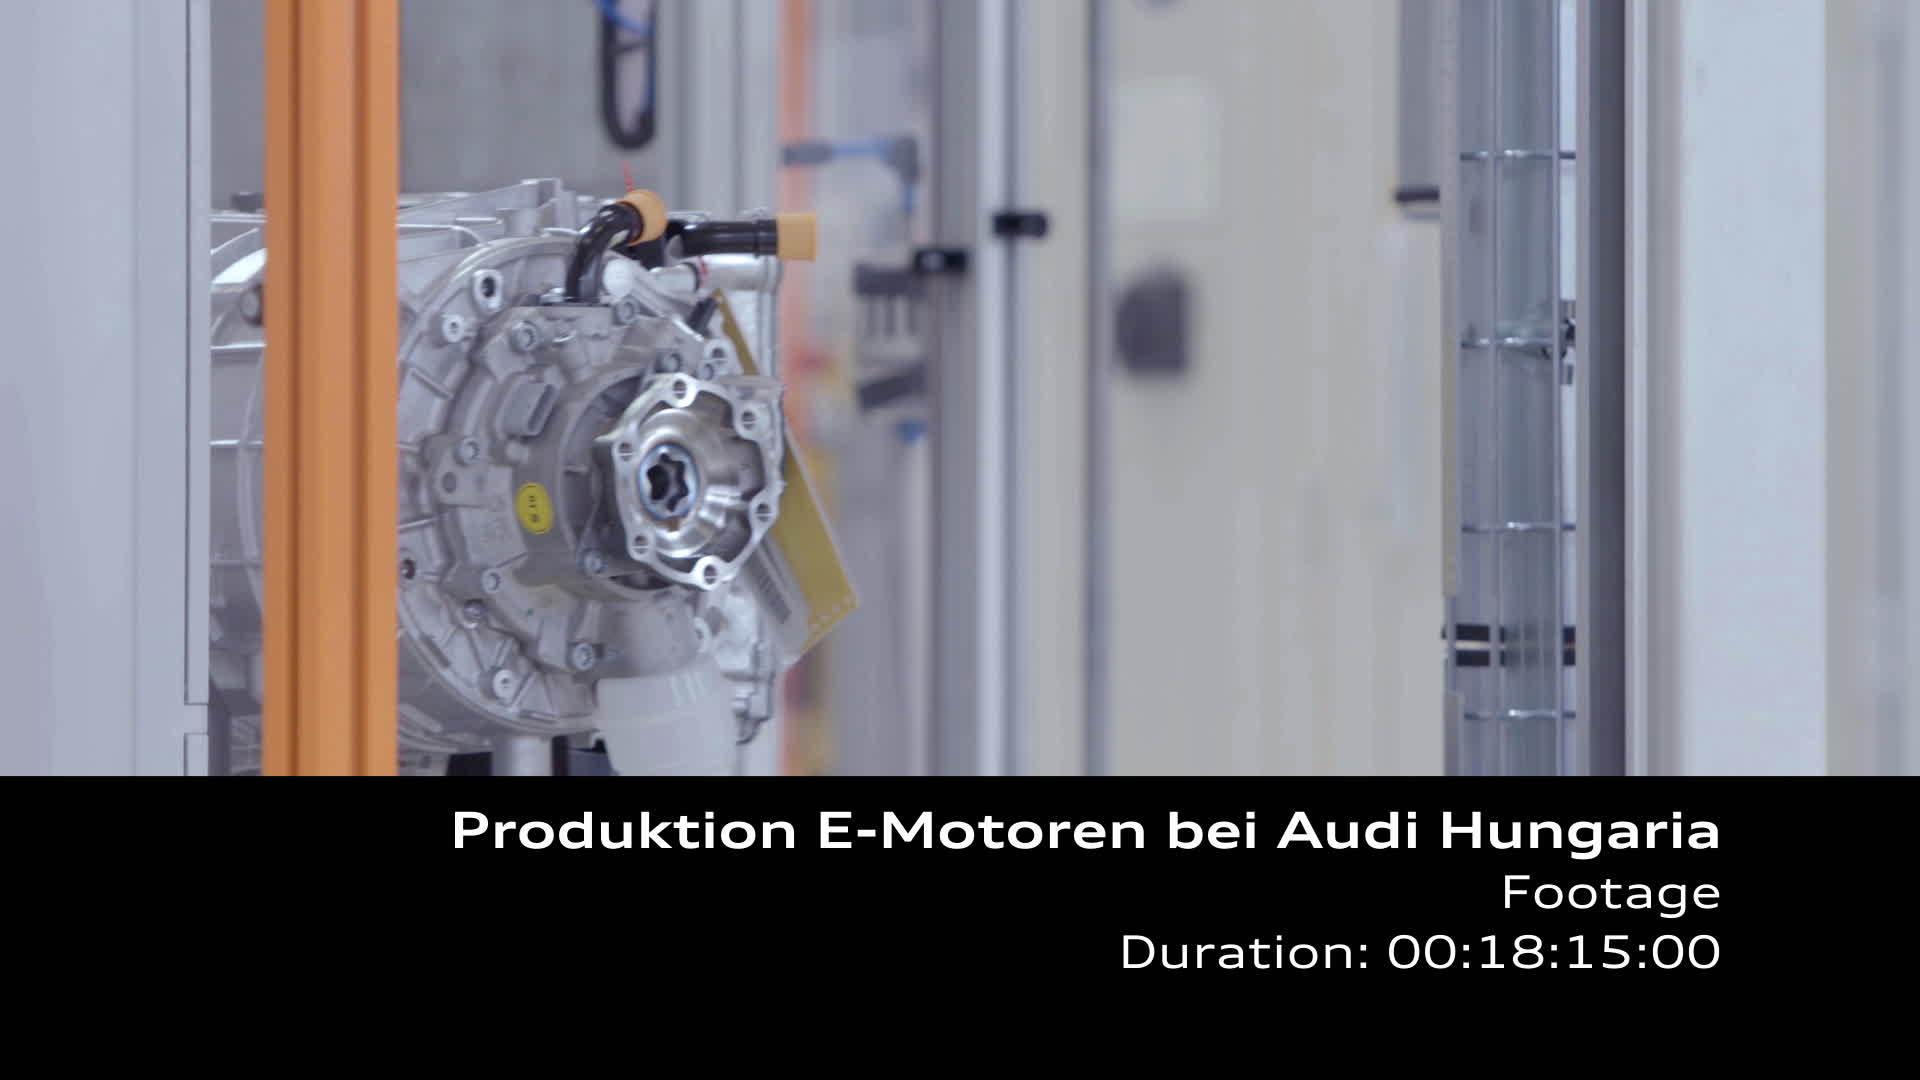 Audi Hungaria startet Serienproduktion von Elektromotoren